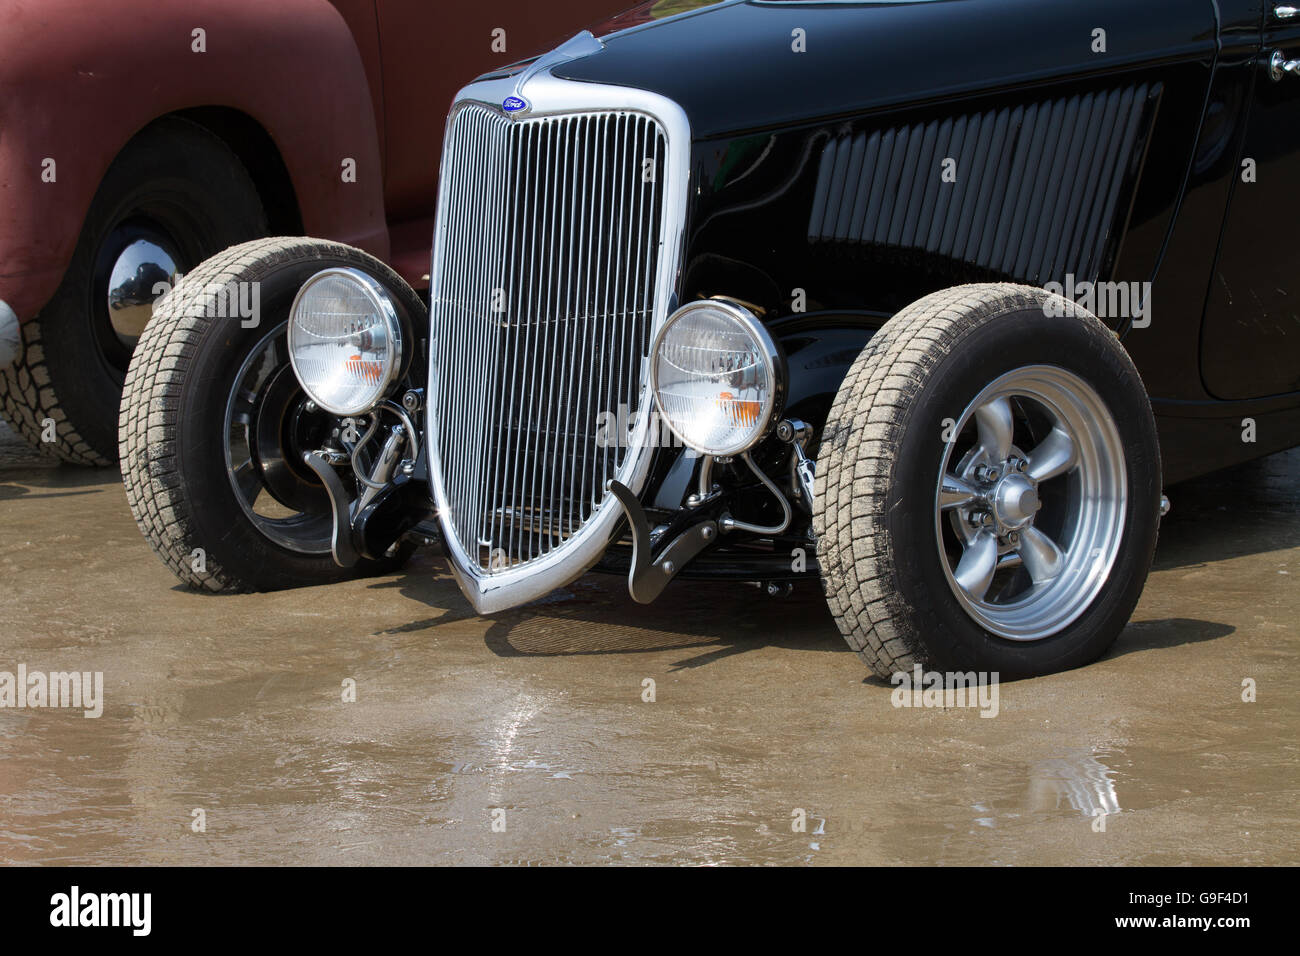 Classic American car taken during a vintage car display held in ...